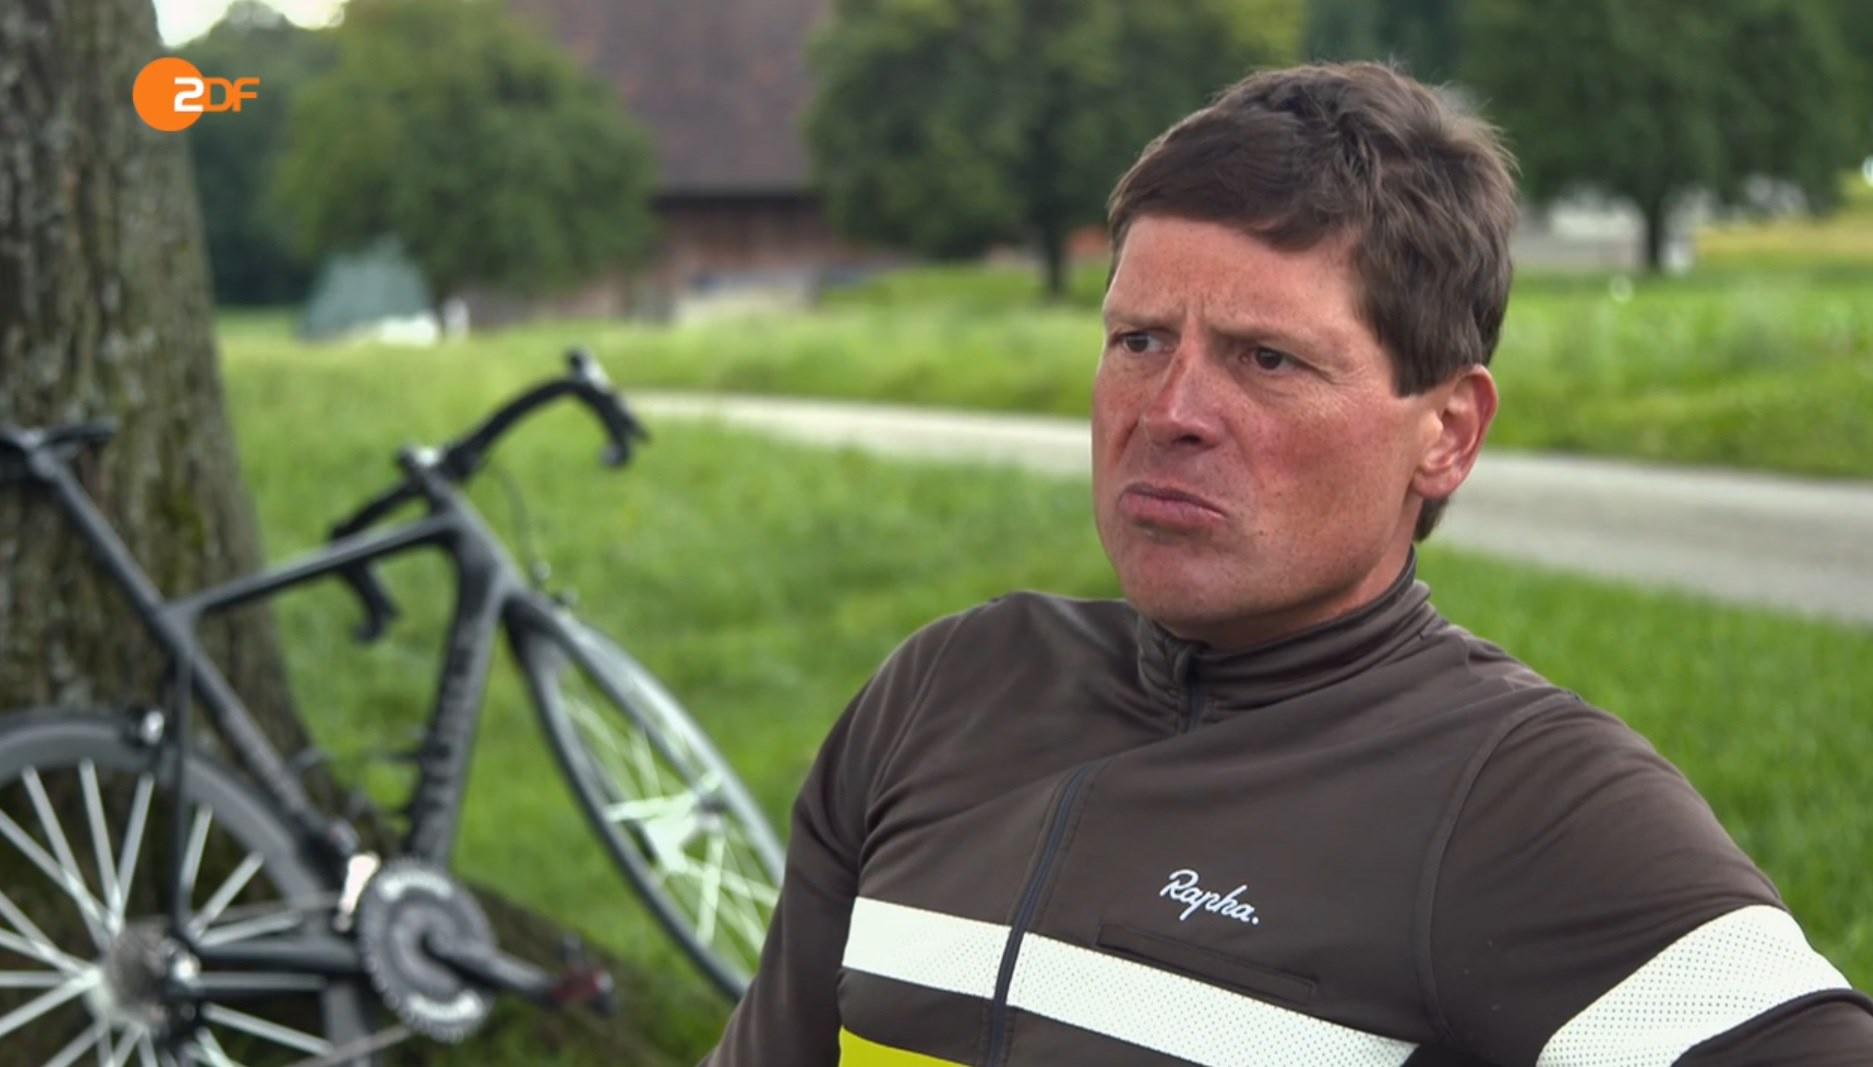 Jan Ullrich in difficoltà